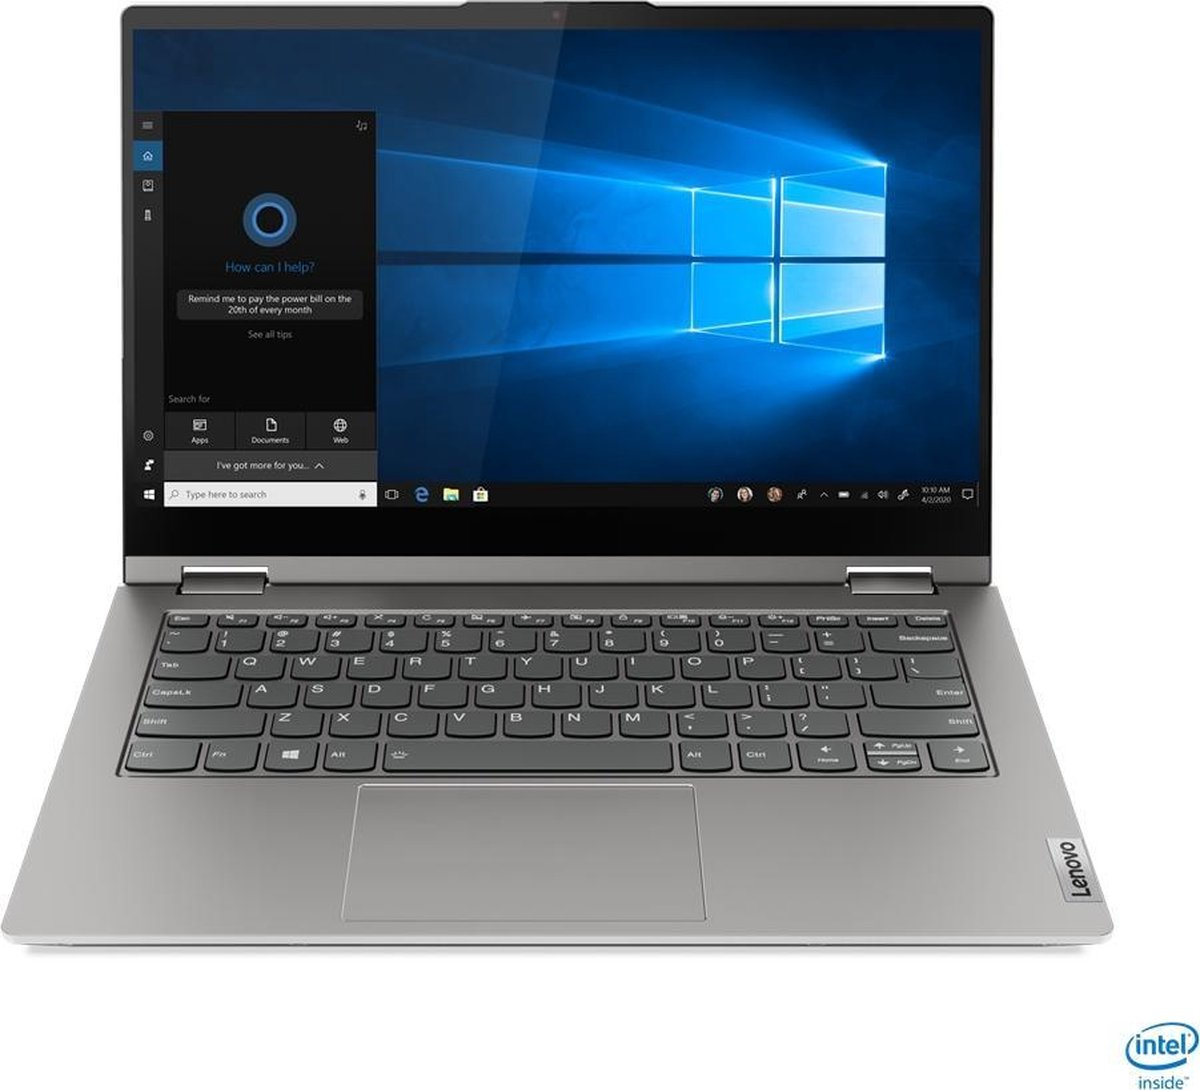 "Lenovo ThinkBook 14s Yoga Hybride (2-in-1) 35,6 cm (14"") 1920 x 1080 Pixels Touchscreen Intel® 11de generatie Core™ i5 8 GB DDR4-SDRAM 256 GB SSD Wi-Fi 6 (802.11ax) Windows 10 Pro Grijs"